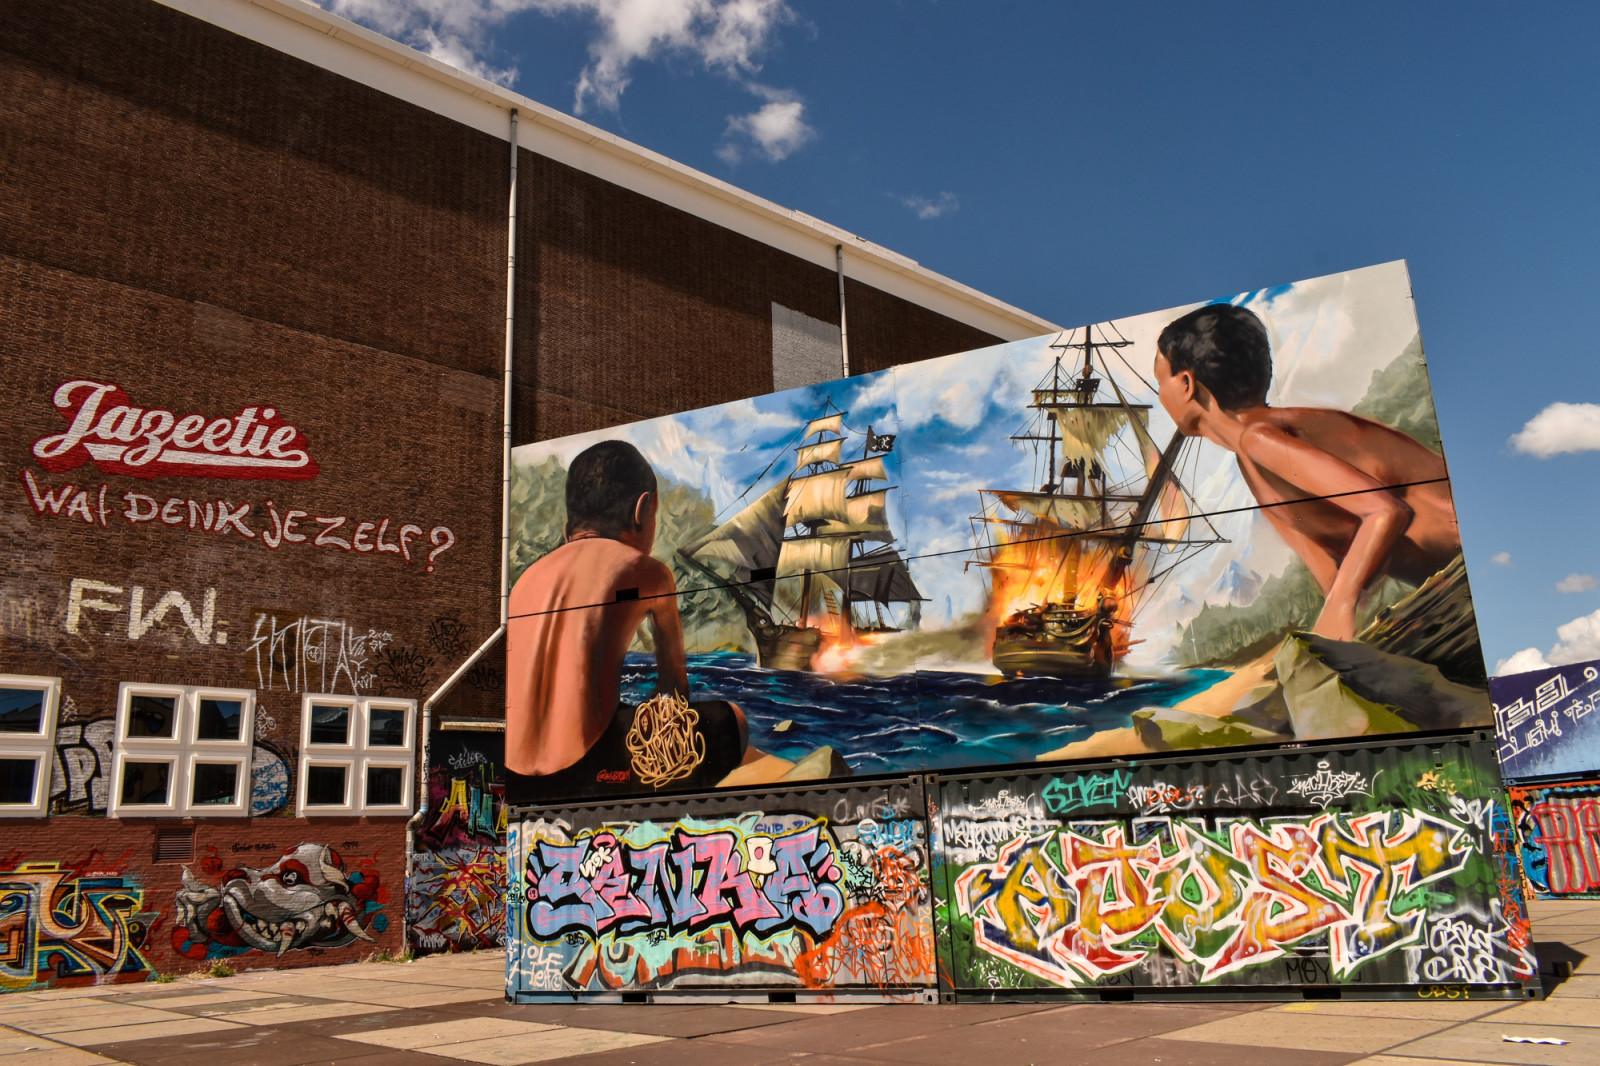 battleship-street-art-in-amsterdam